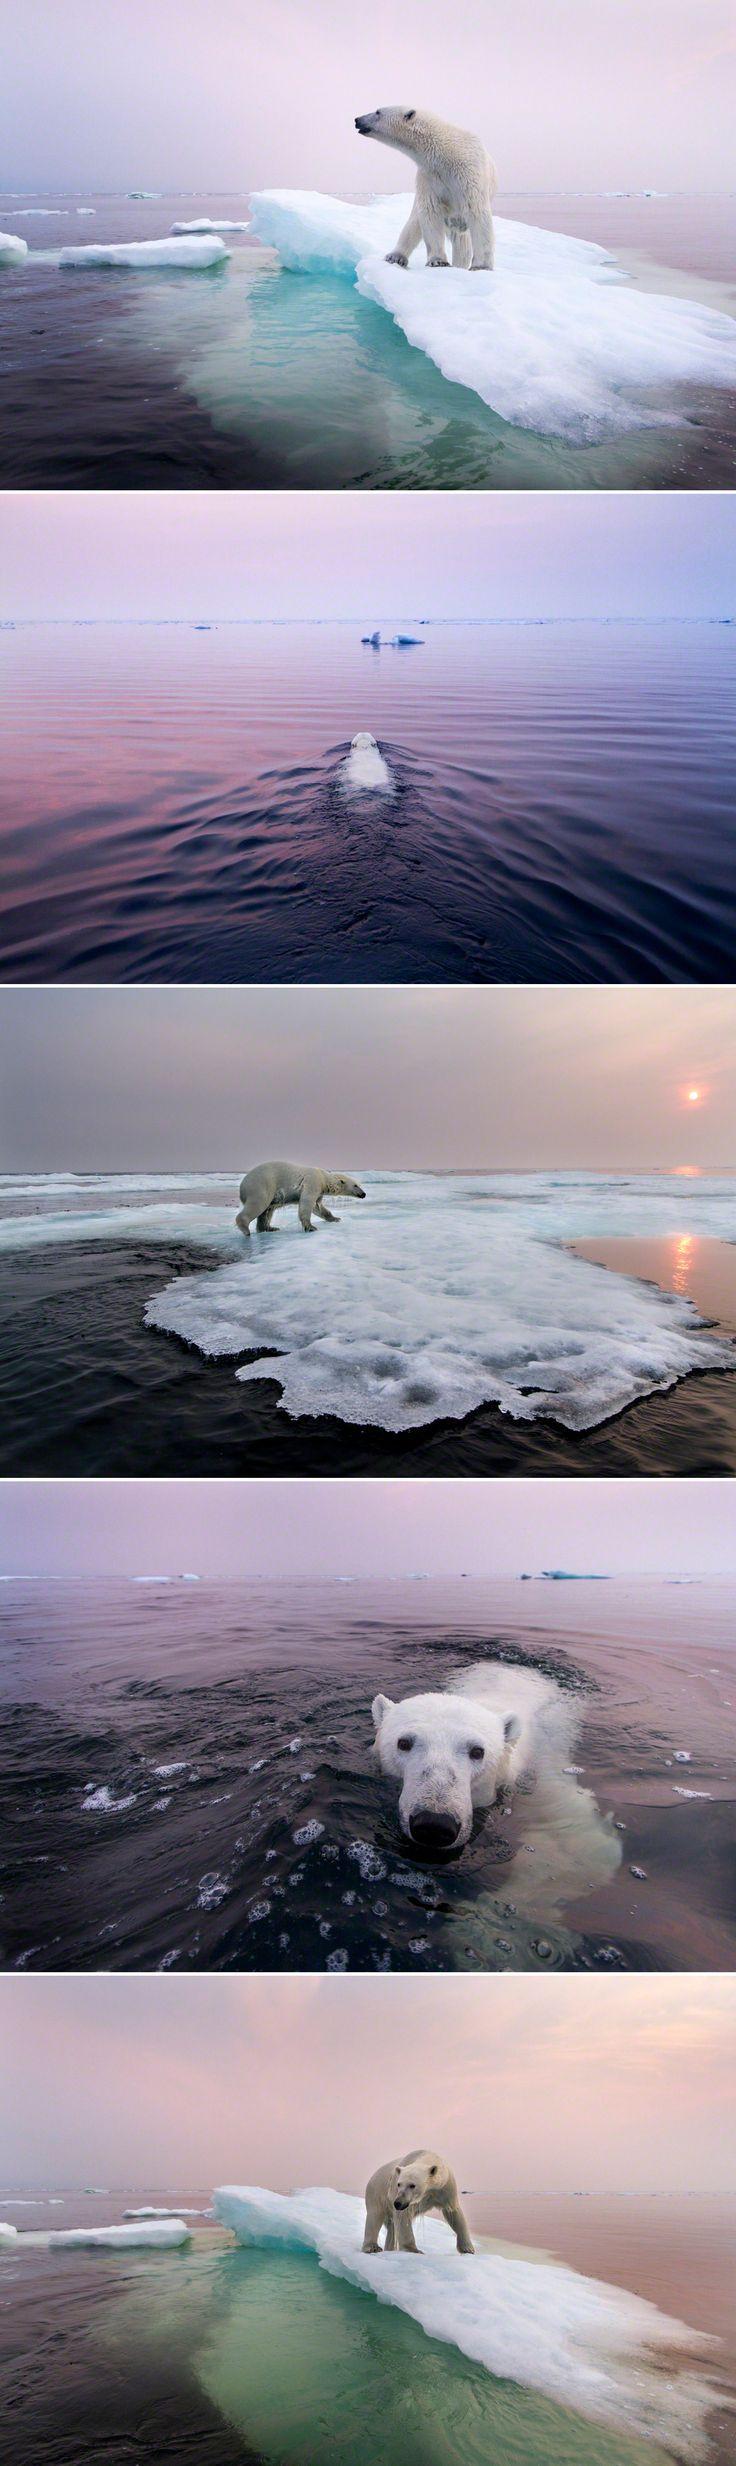 Polar bear, Manitoba.                                                                                                                                                      More